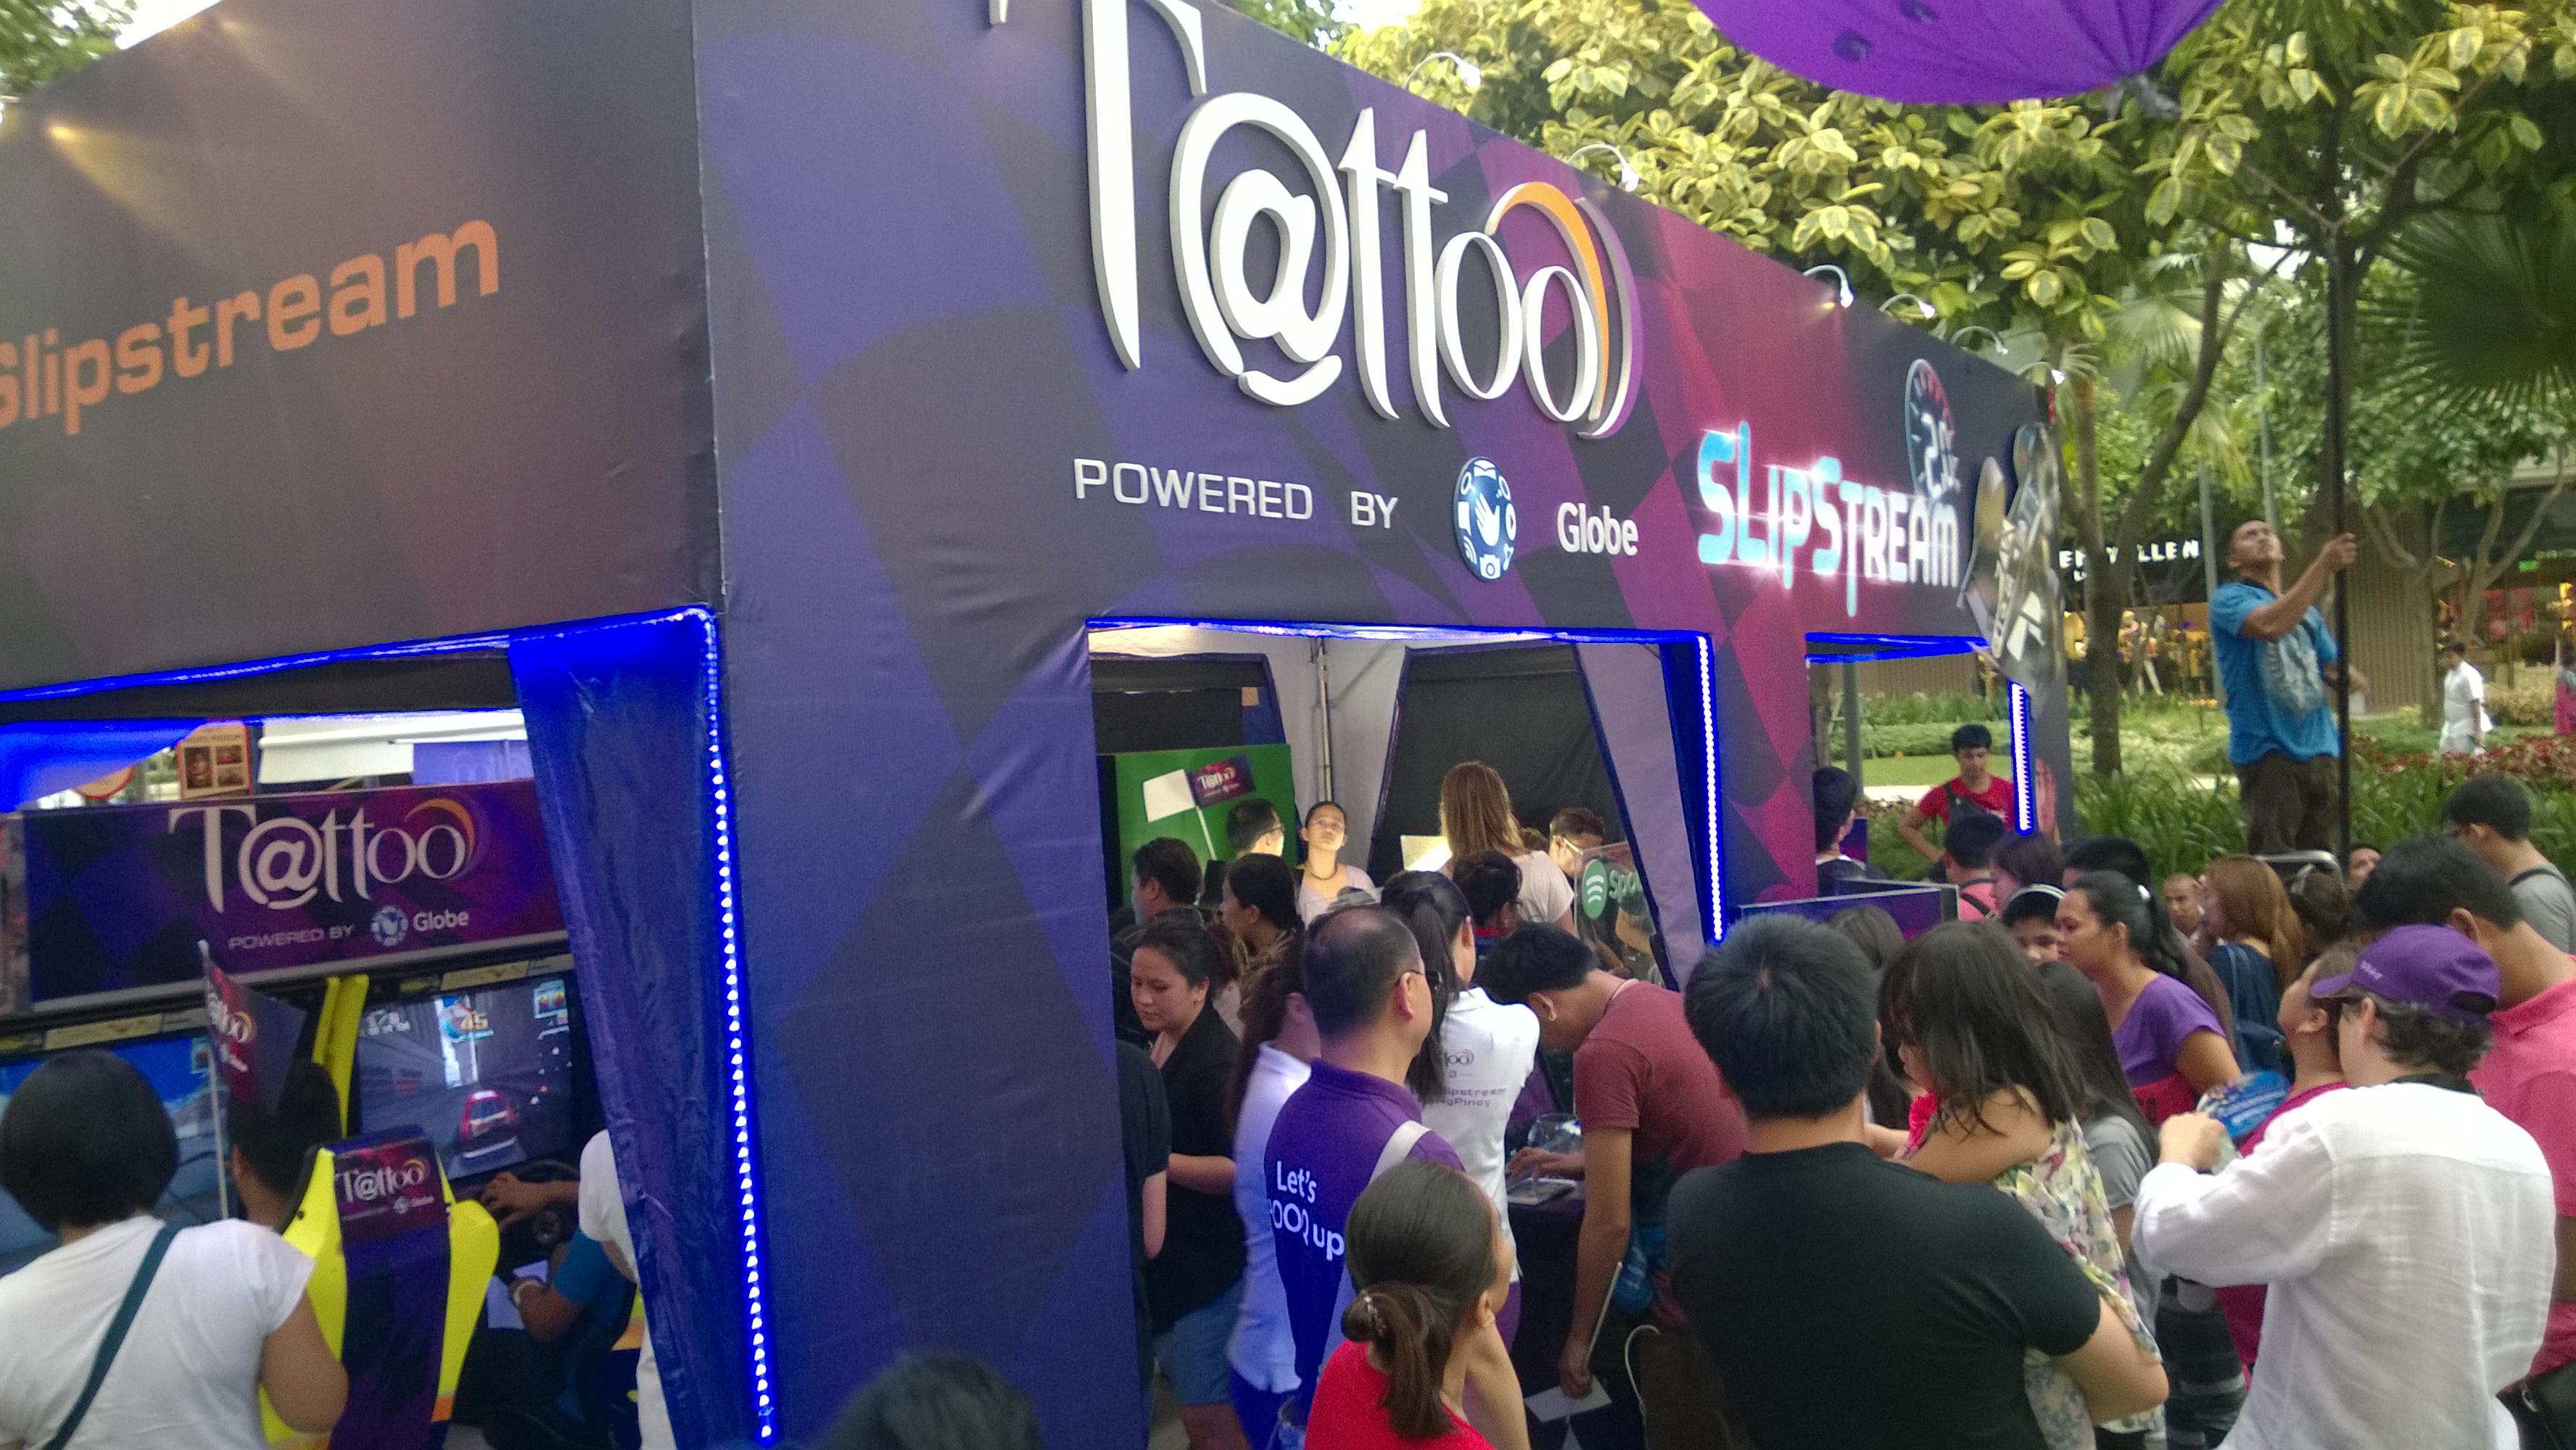 Globe Telecom Slip Stream Marlon Stockinger BGC Taguig Manila Philippines Duane Bacon Bilis Ng Pinoy Tattoo LTE Internet Provider